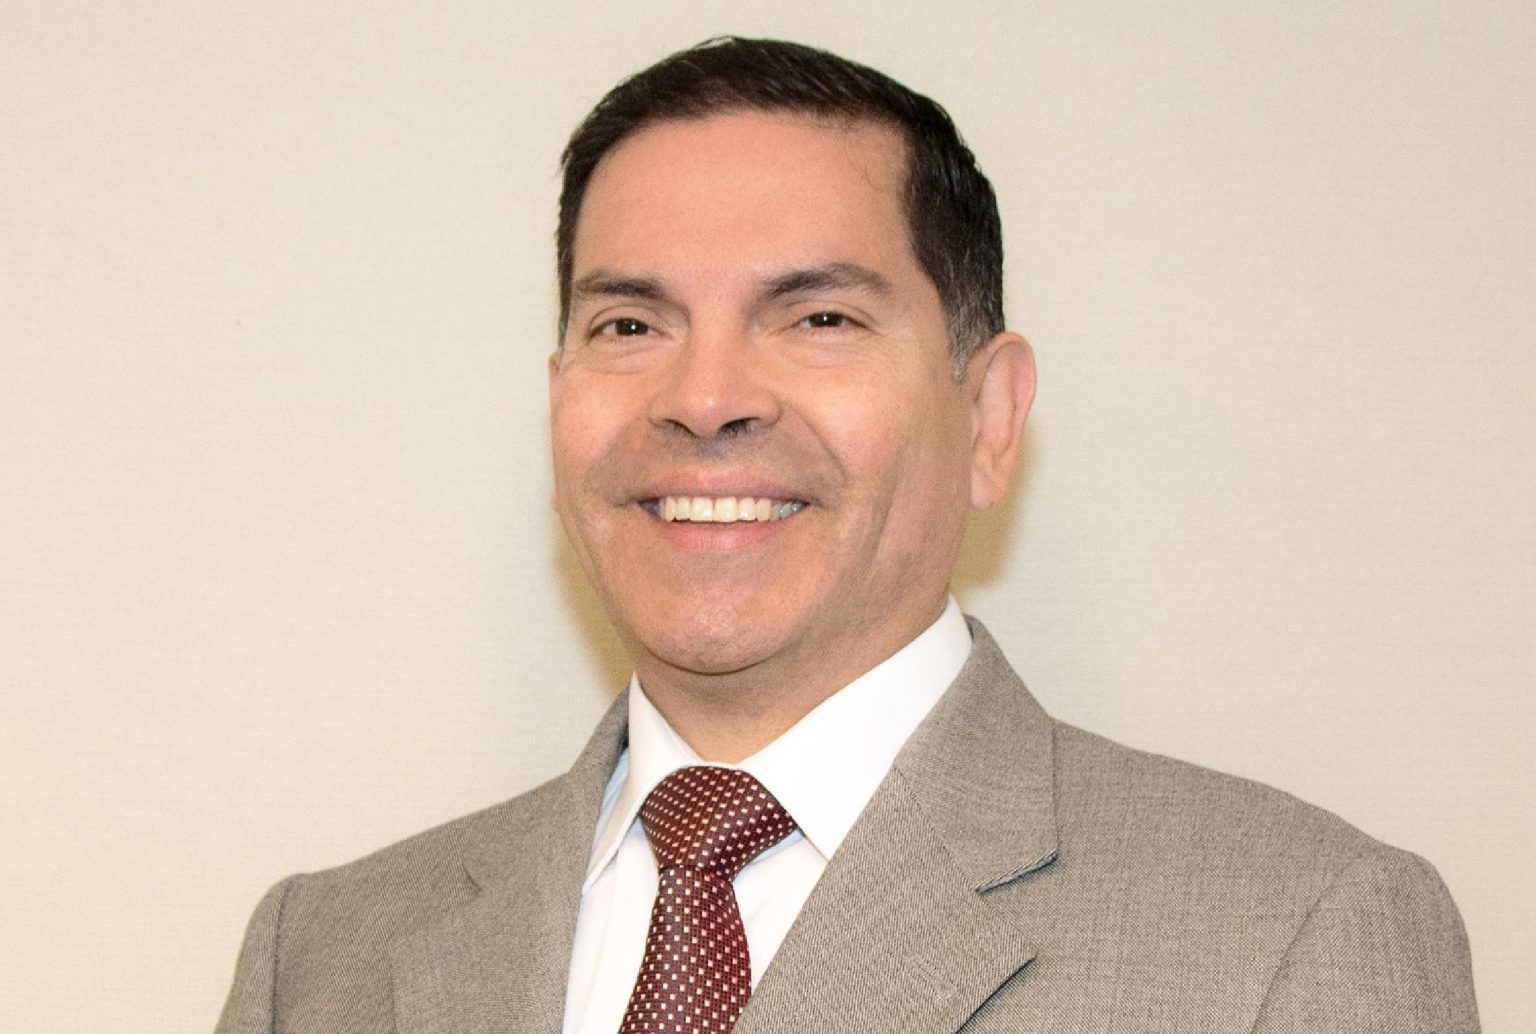 Guillermo Vidalon